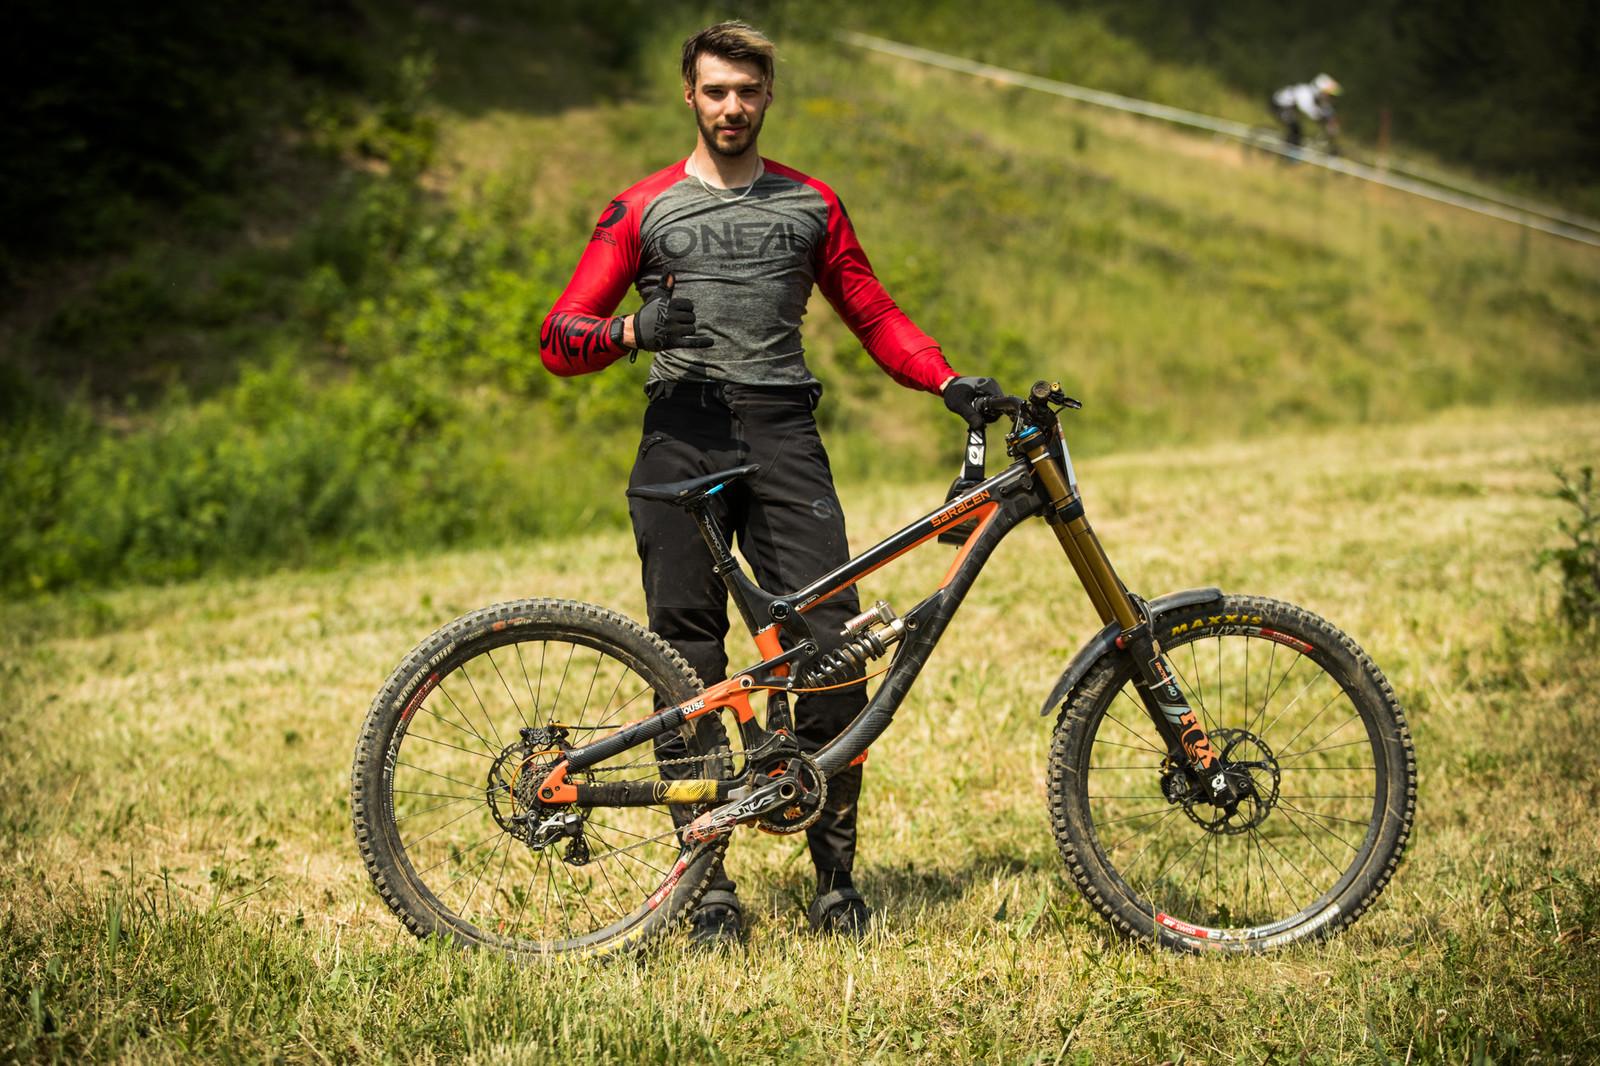 Stivian Gatev and his Saracen Myst - 25 Downhill Bikes - iXS DH Cup #3 - Abetone - Mountain Biking Pictures - Vital MTB